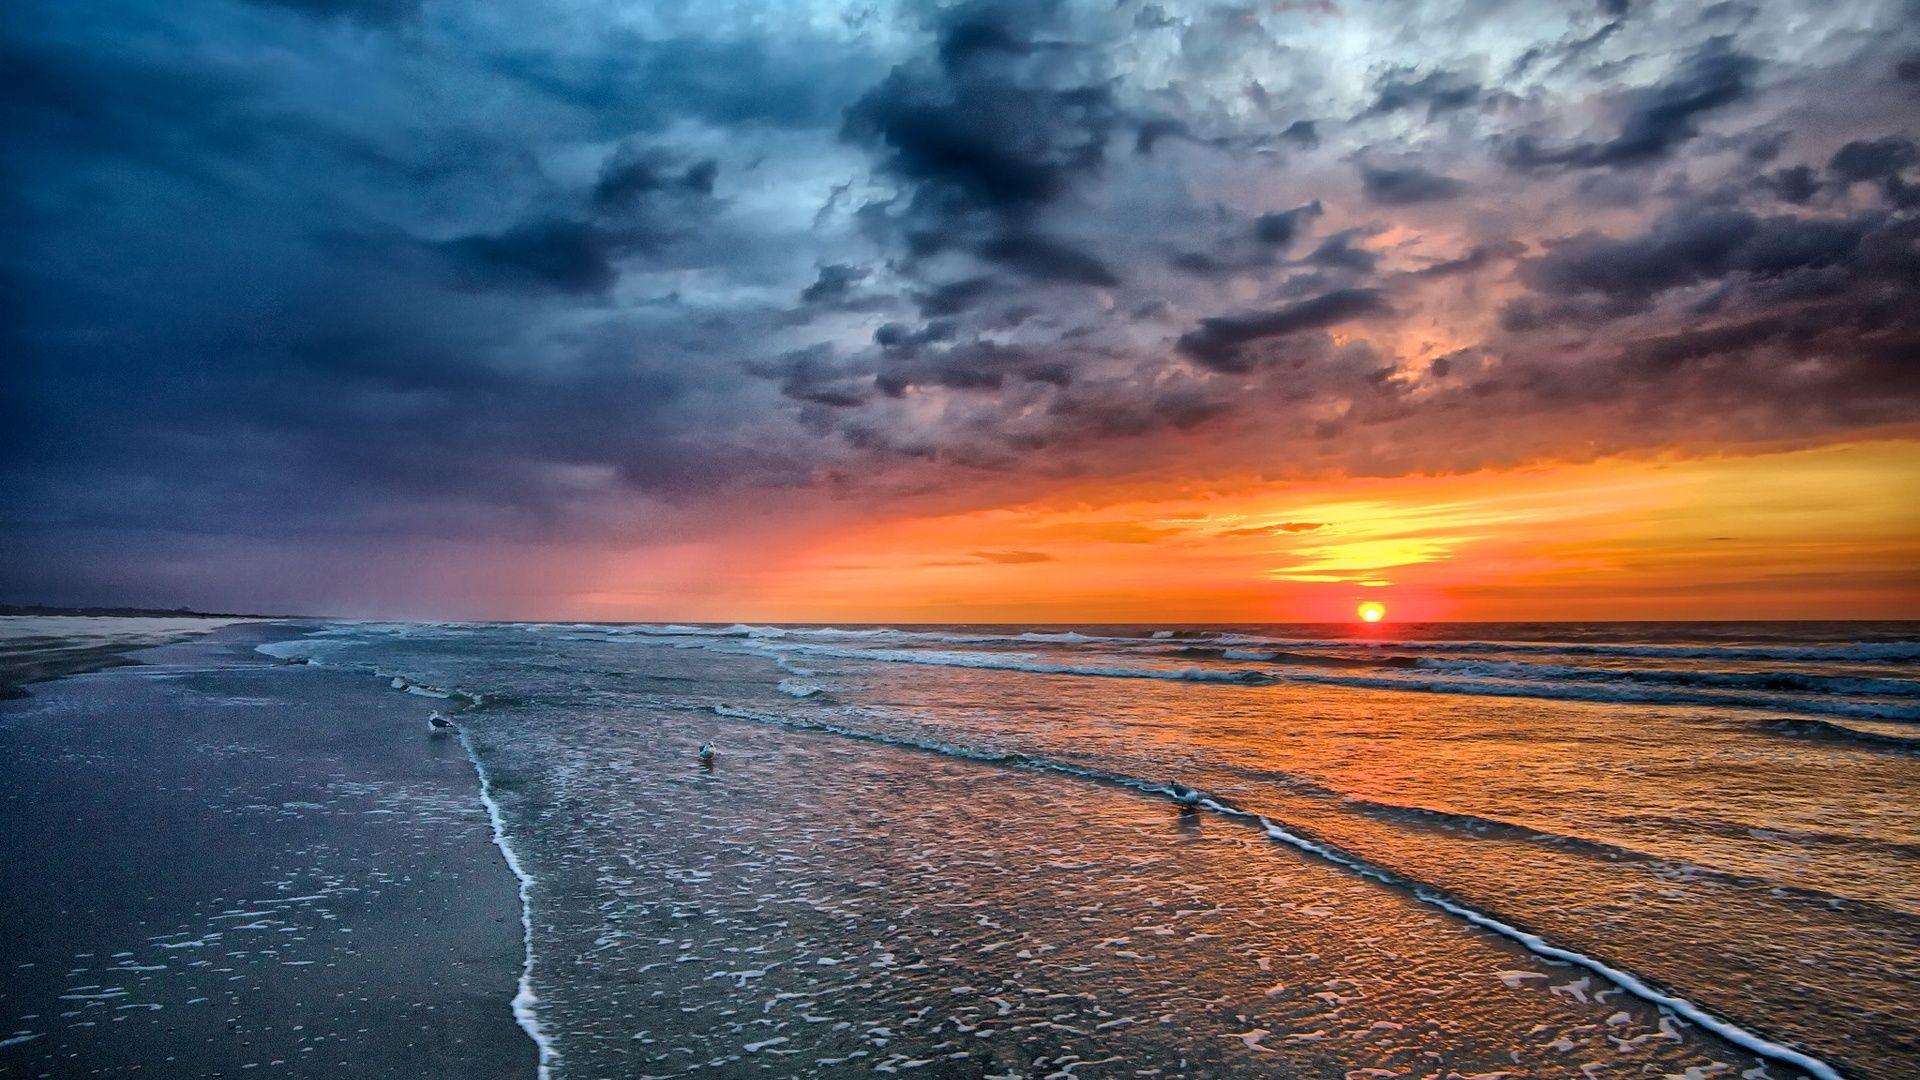 Sea Sunrise Sunrise Wallpaper Landscape Scenery Sunrise Background